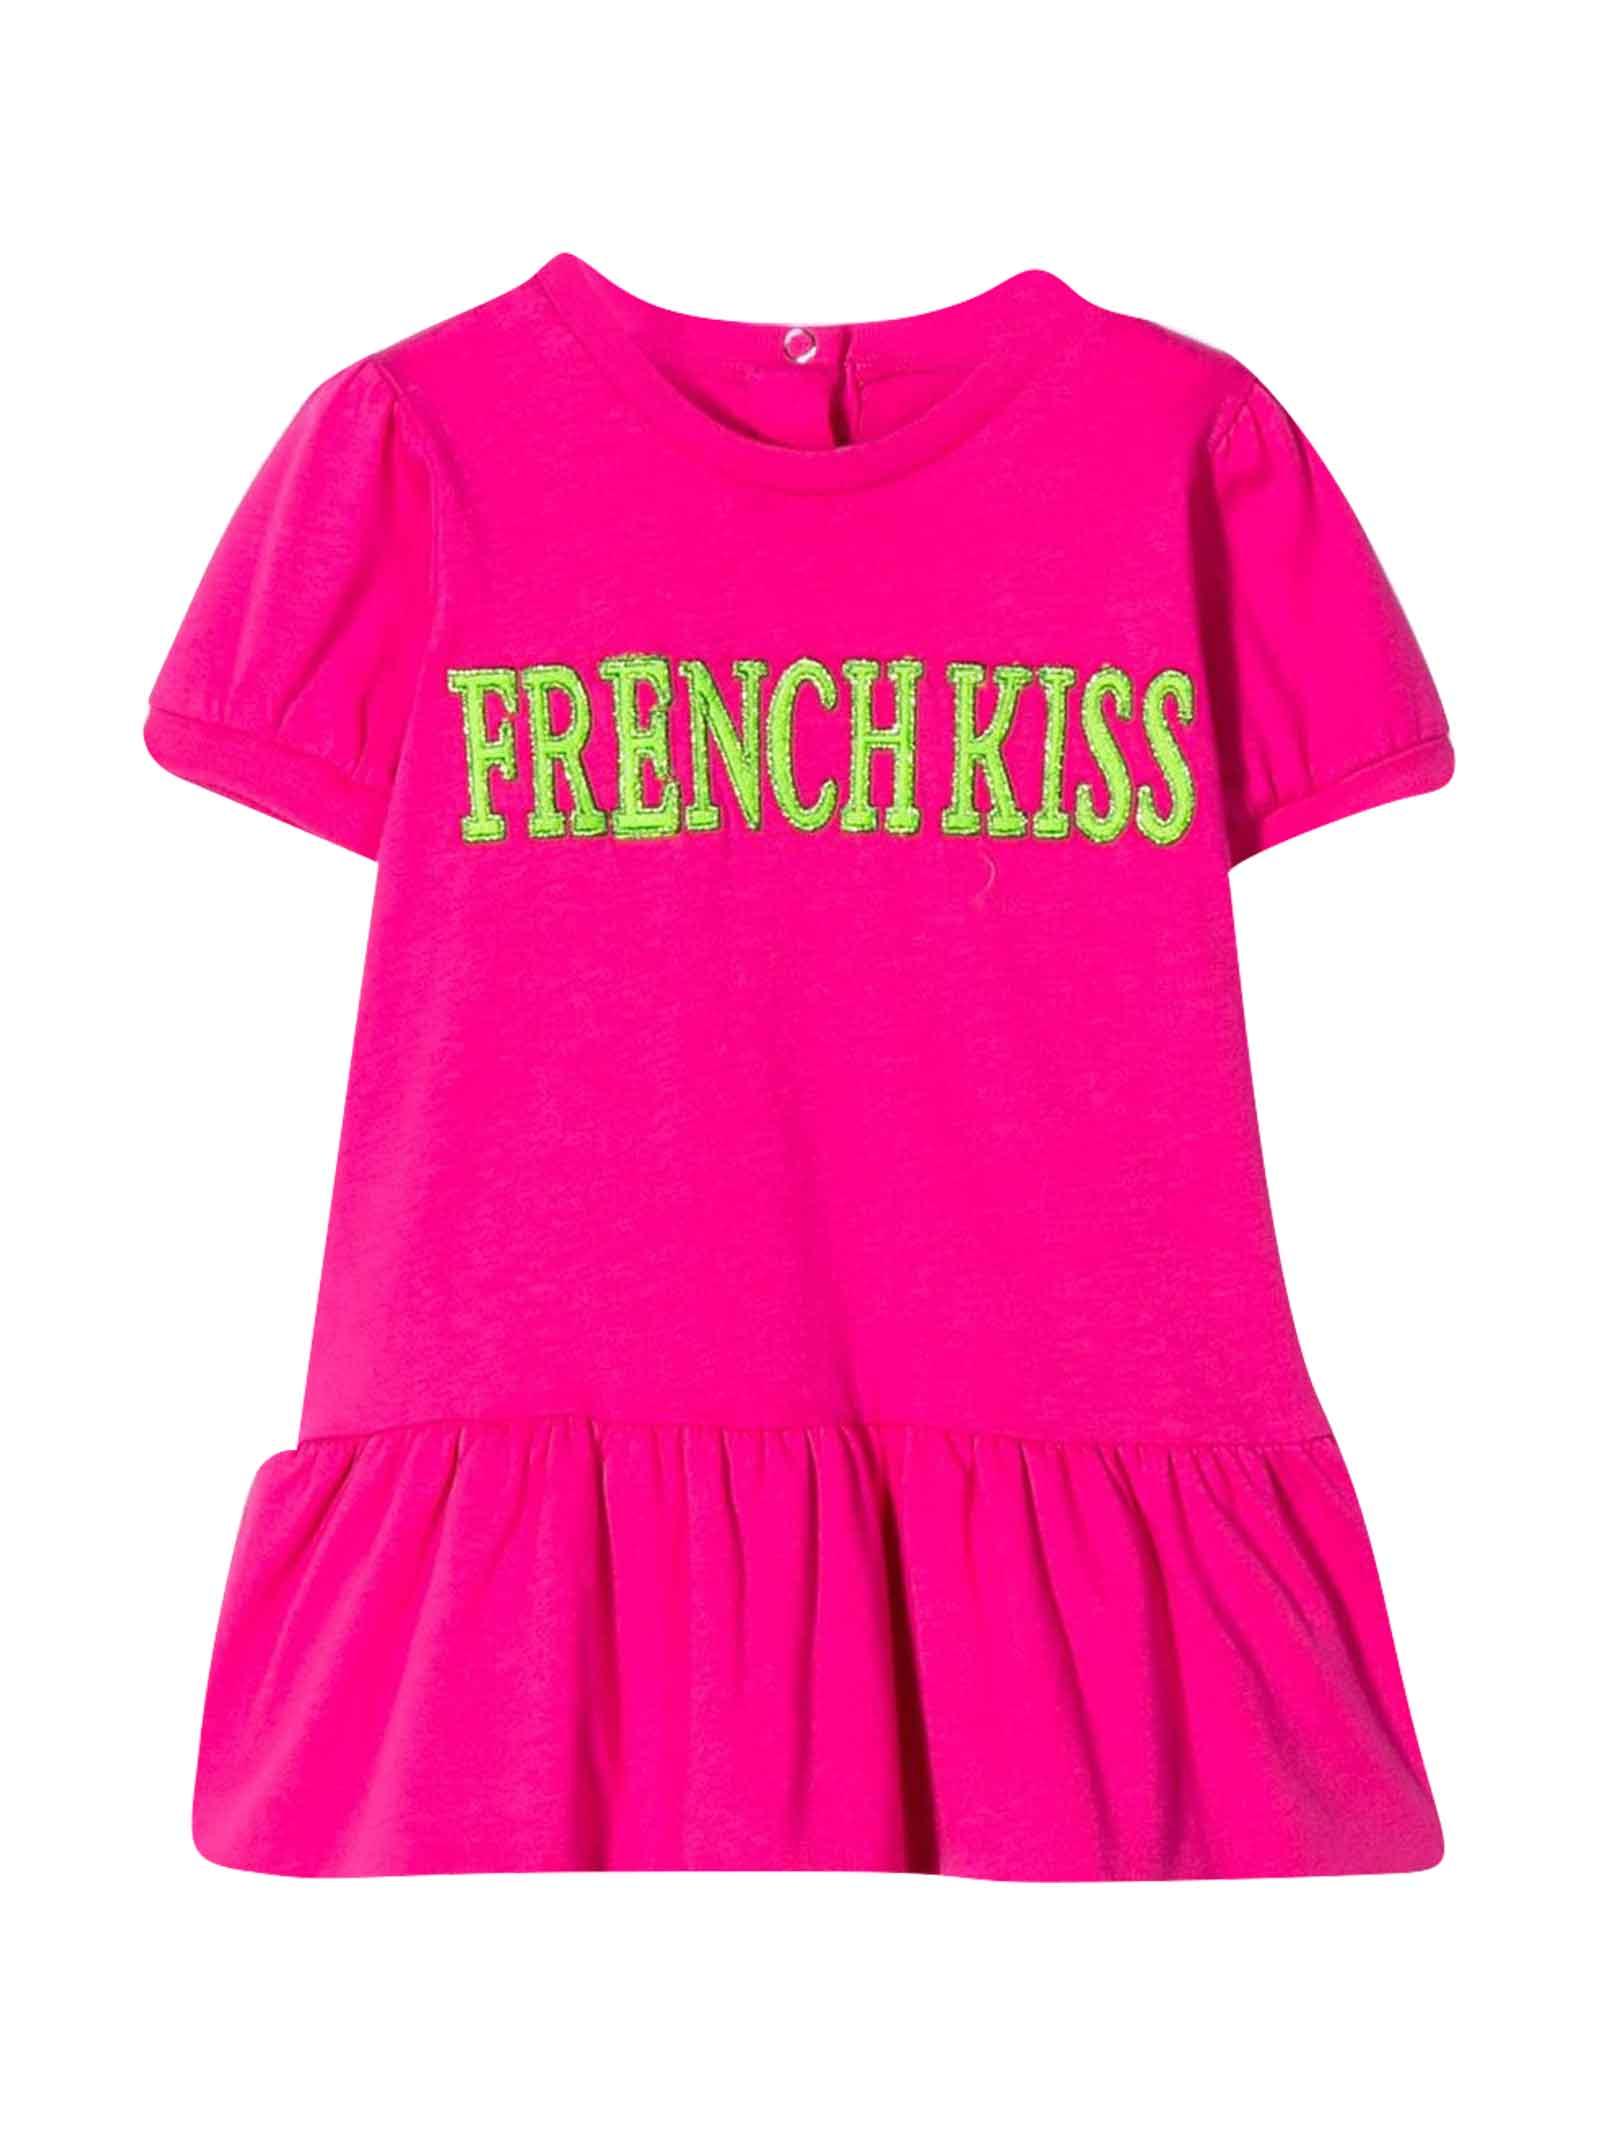 Buy Alberta Ferretti Fuchsia Dress With french Kiss Embroidery online, shop Alberta Ferretti with free shipping